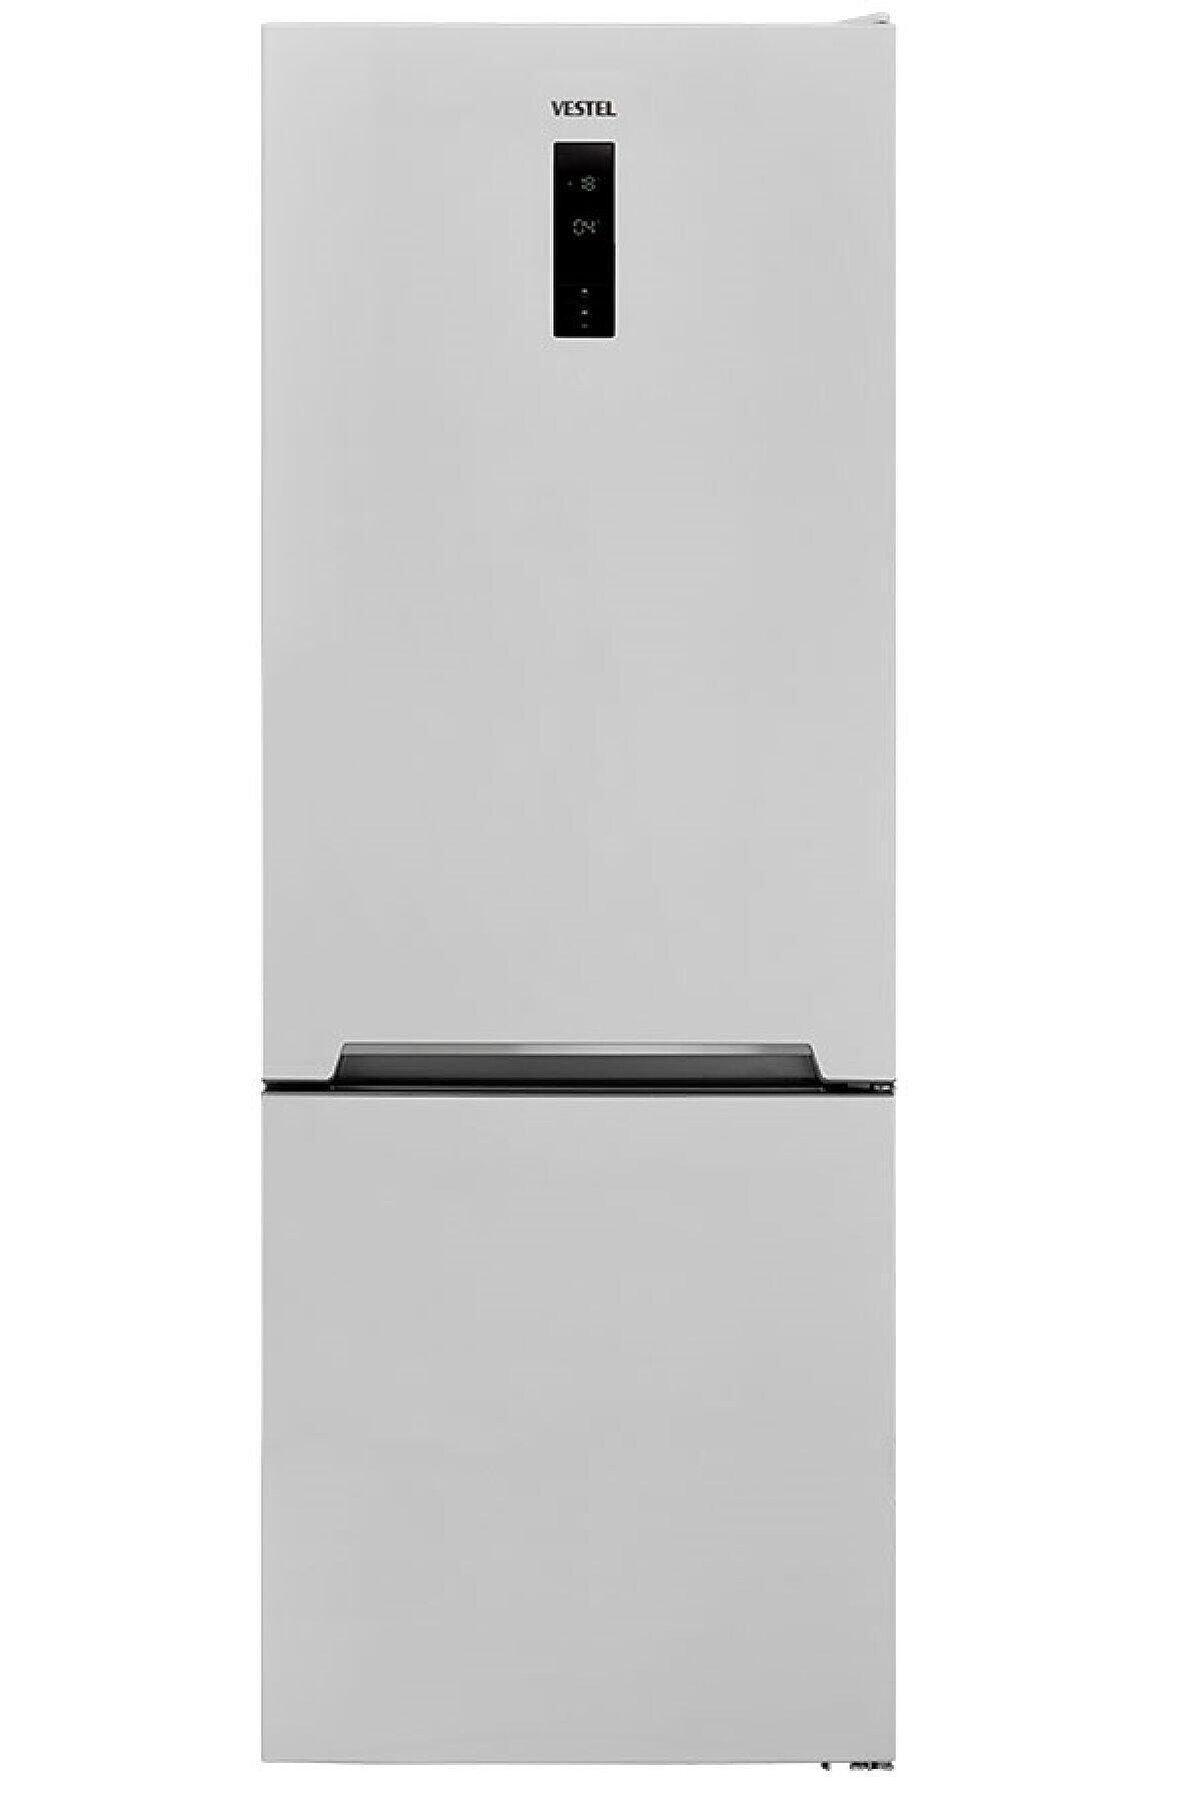 VESTEL NFK5402 E A++ GI WIFI 540 Lt No-Frost Kombi Buzdolabı